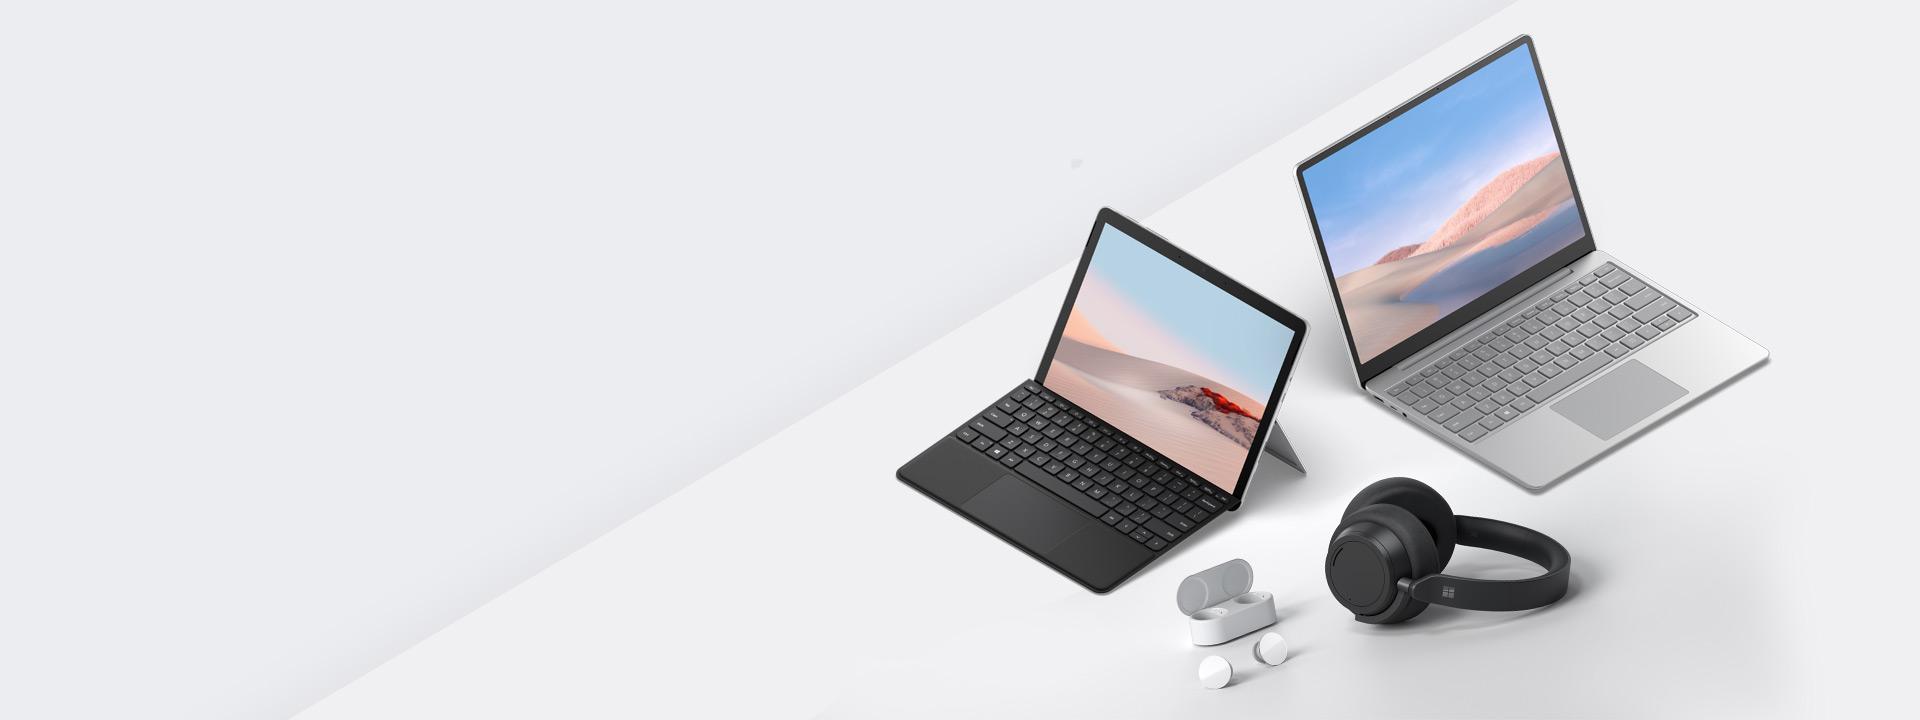 Afbeelding met Surface Laptop Go en Surface Go 2 met oordopjes en koptelefoon